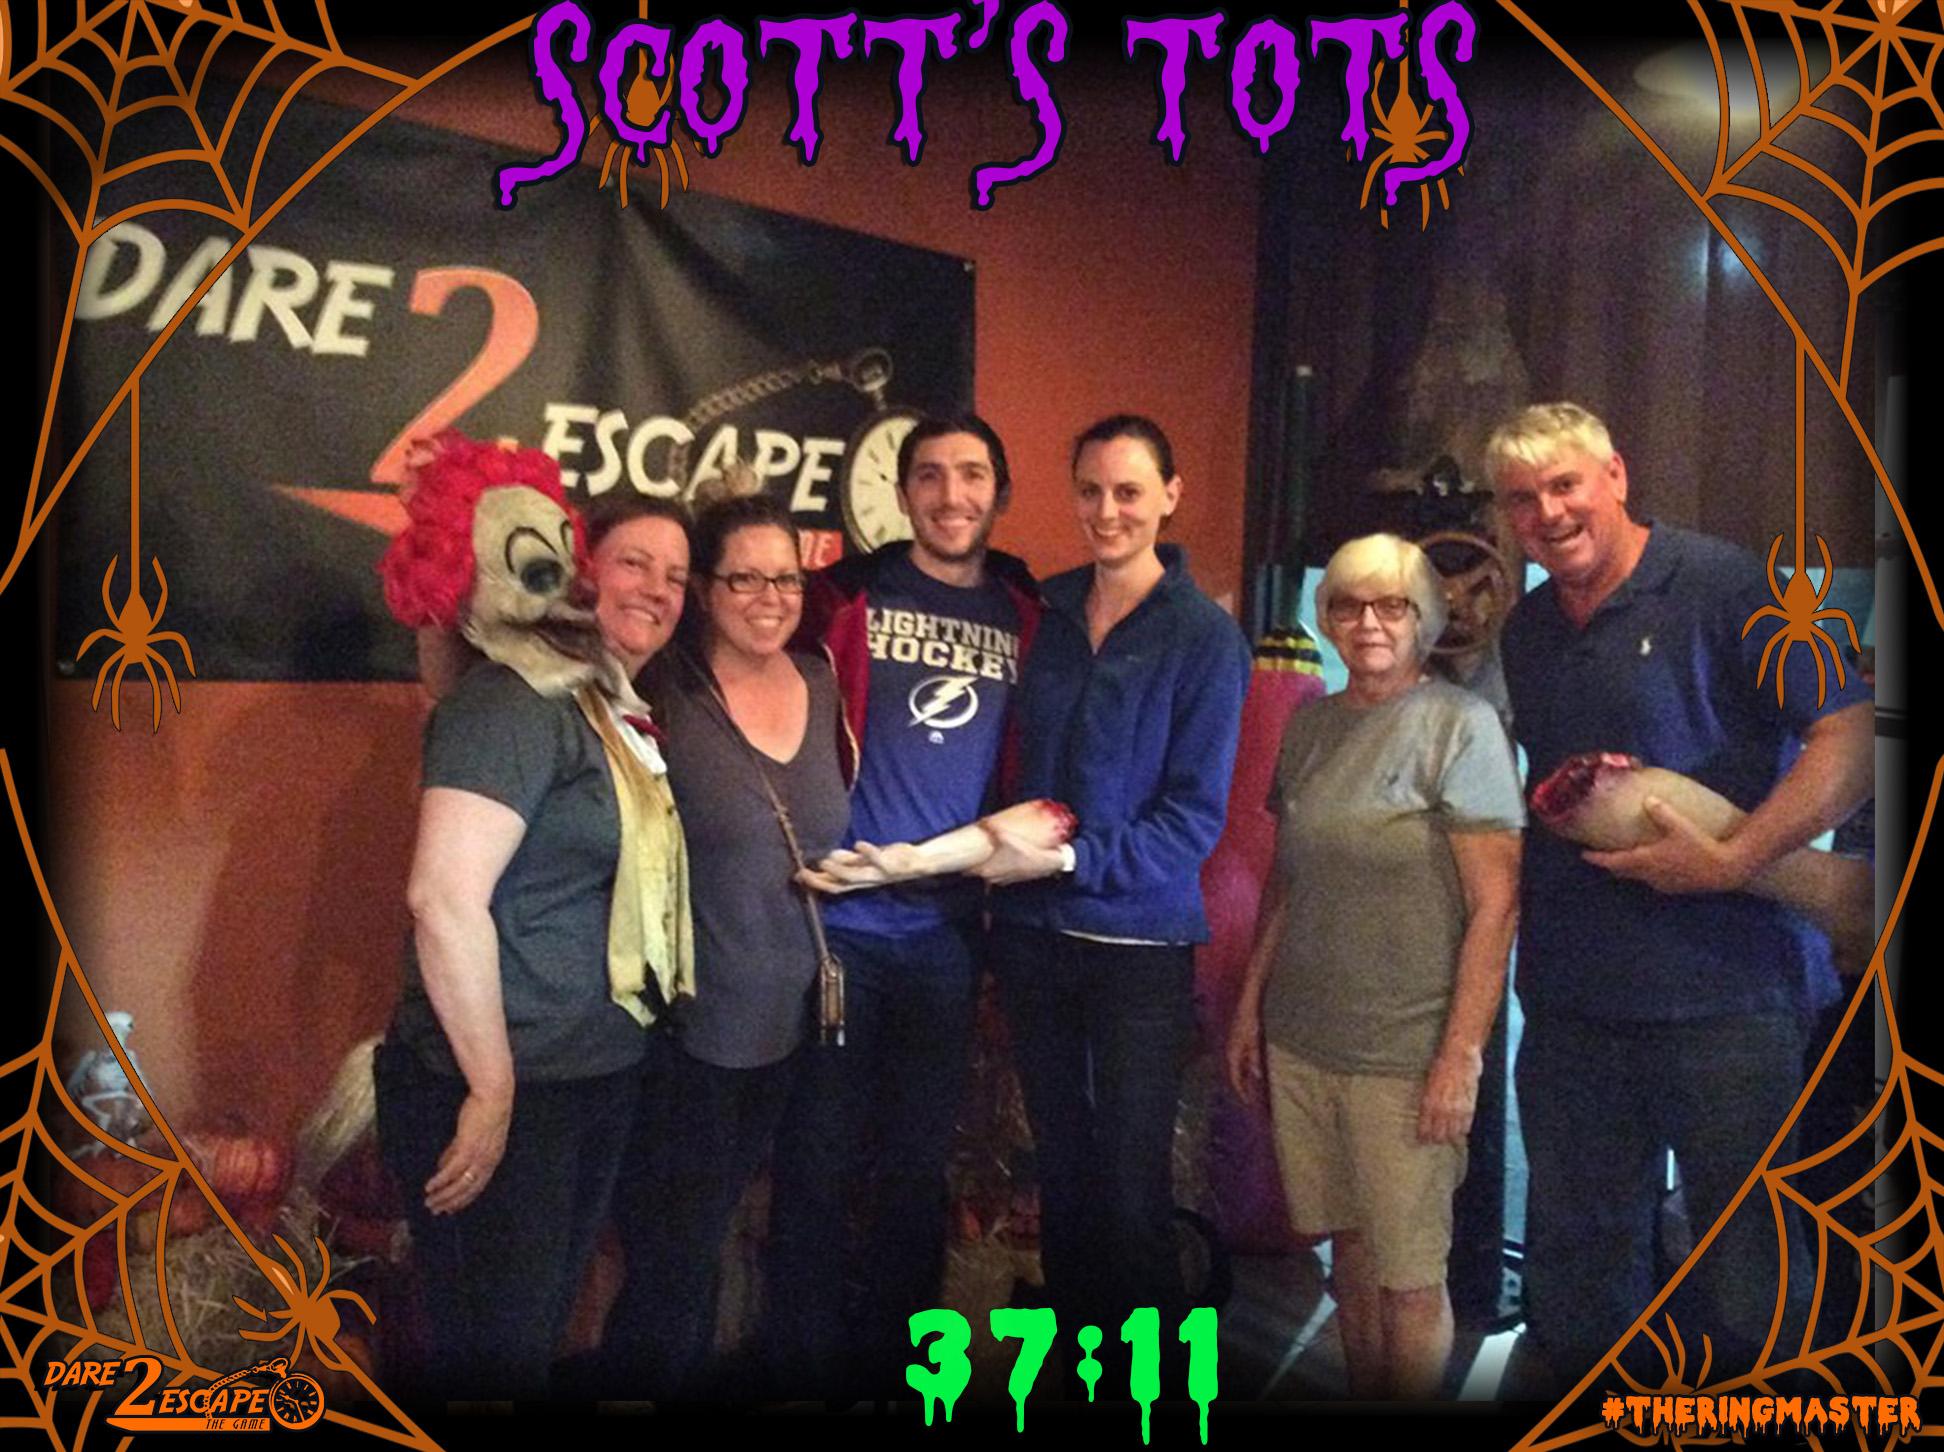 ScottsTots3711.jpg